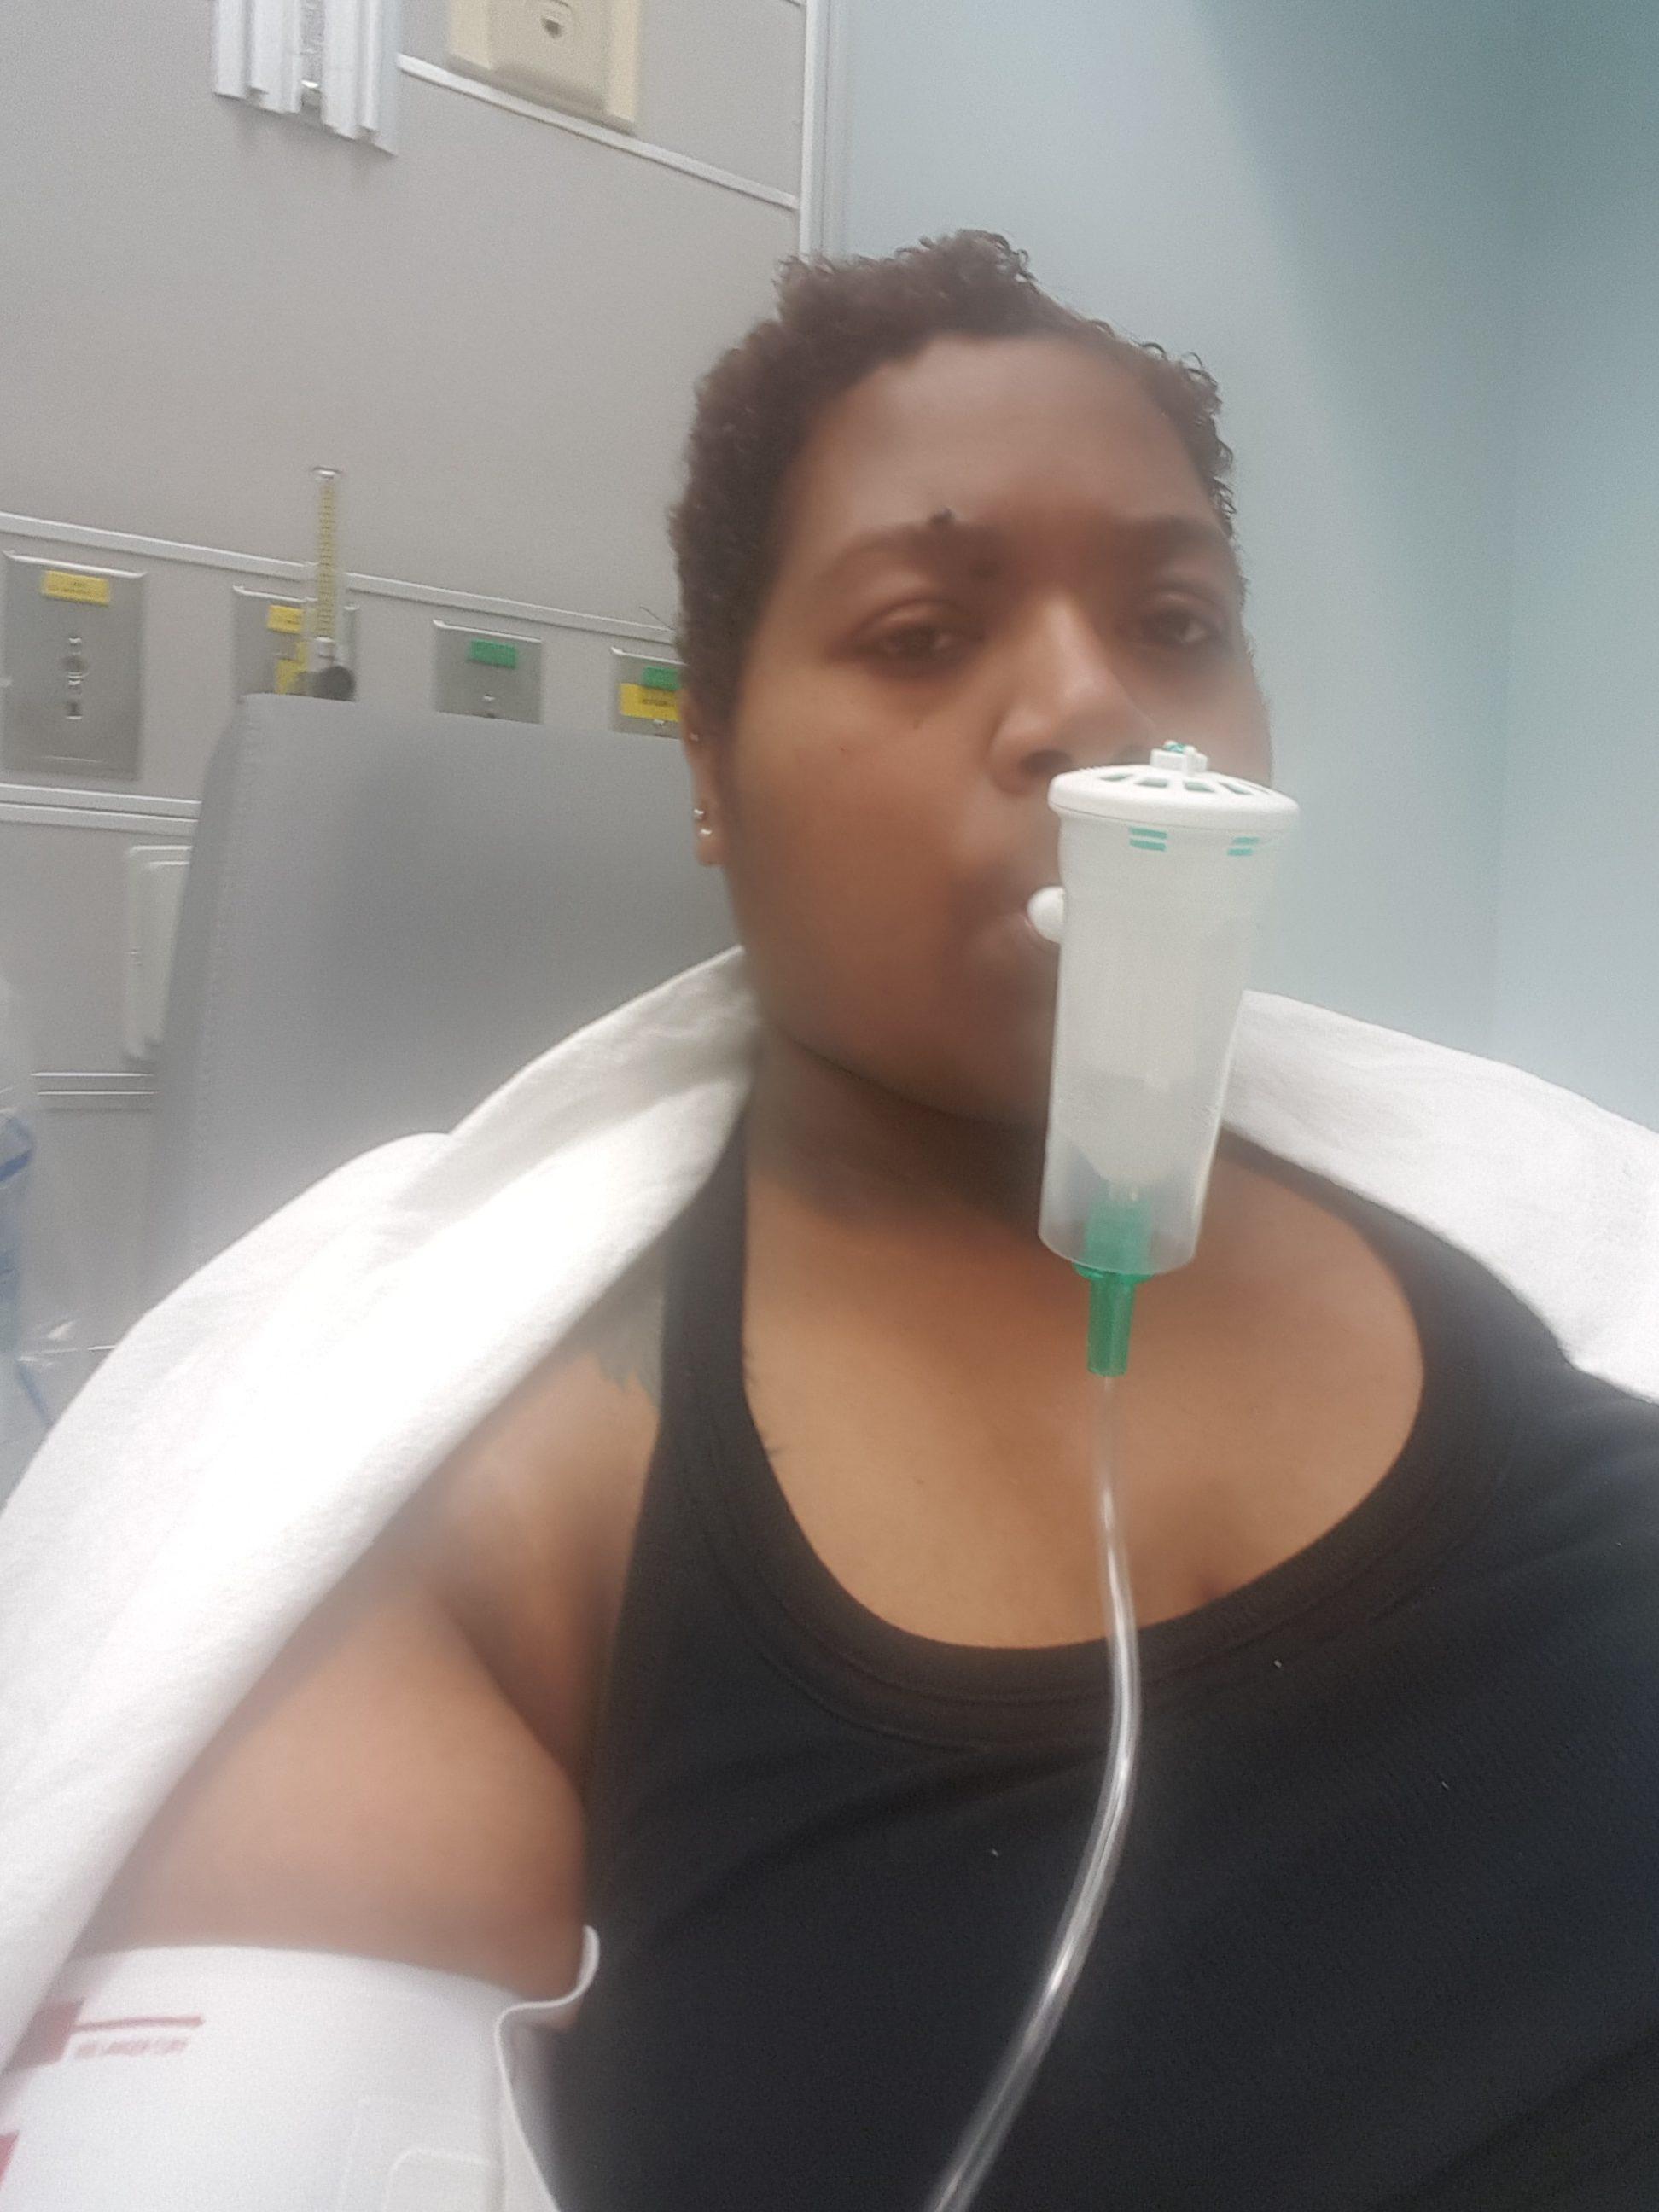 Jae being treated for pneumonia.